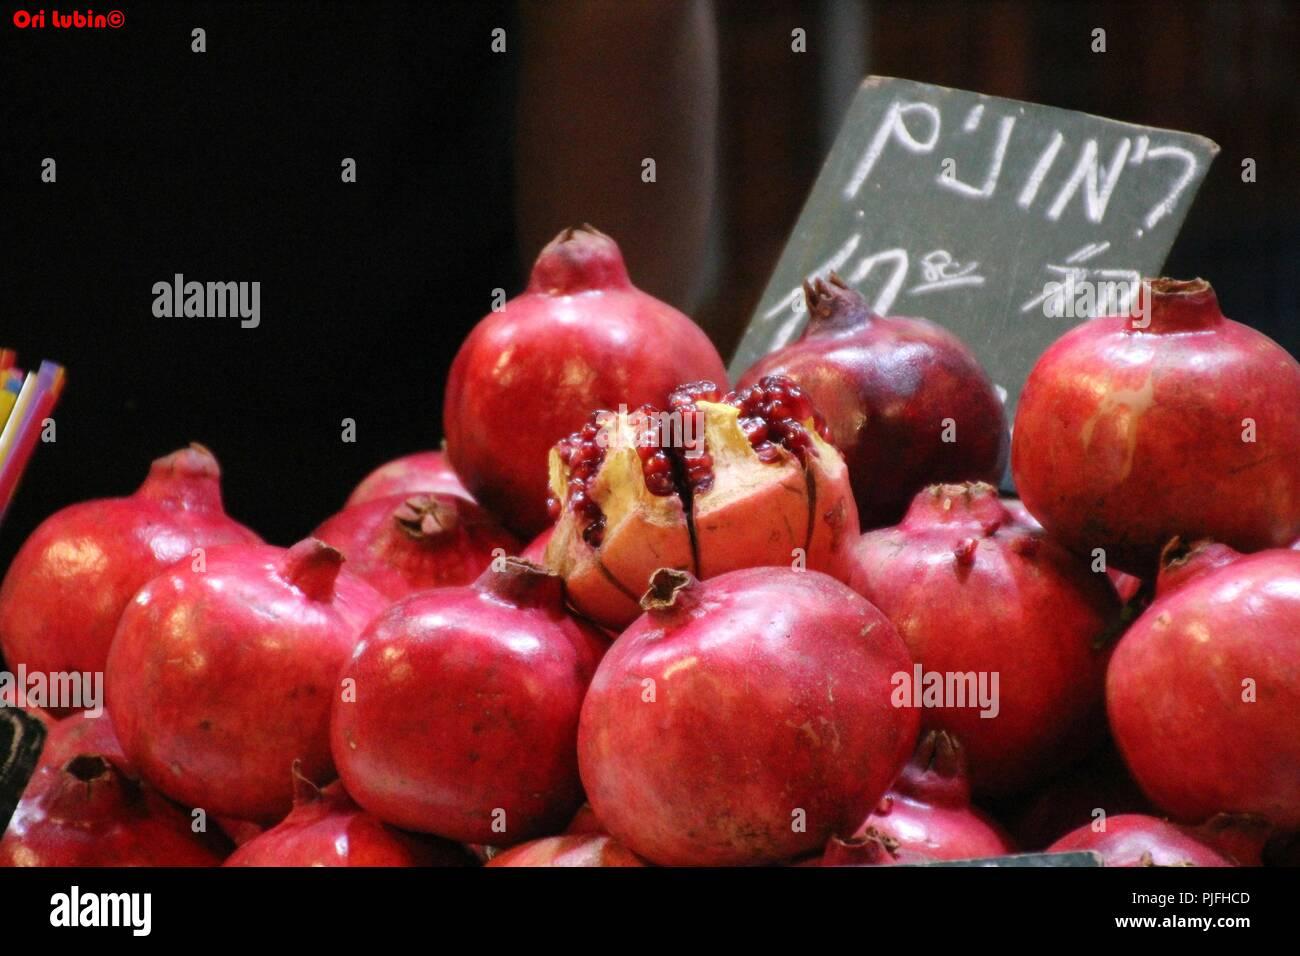 Fresh Grenades - Stock Image